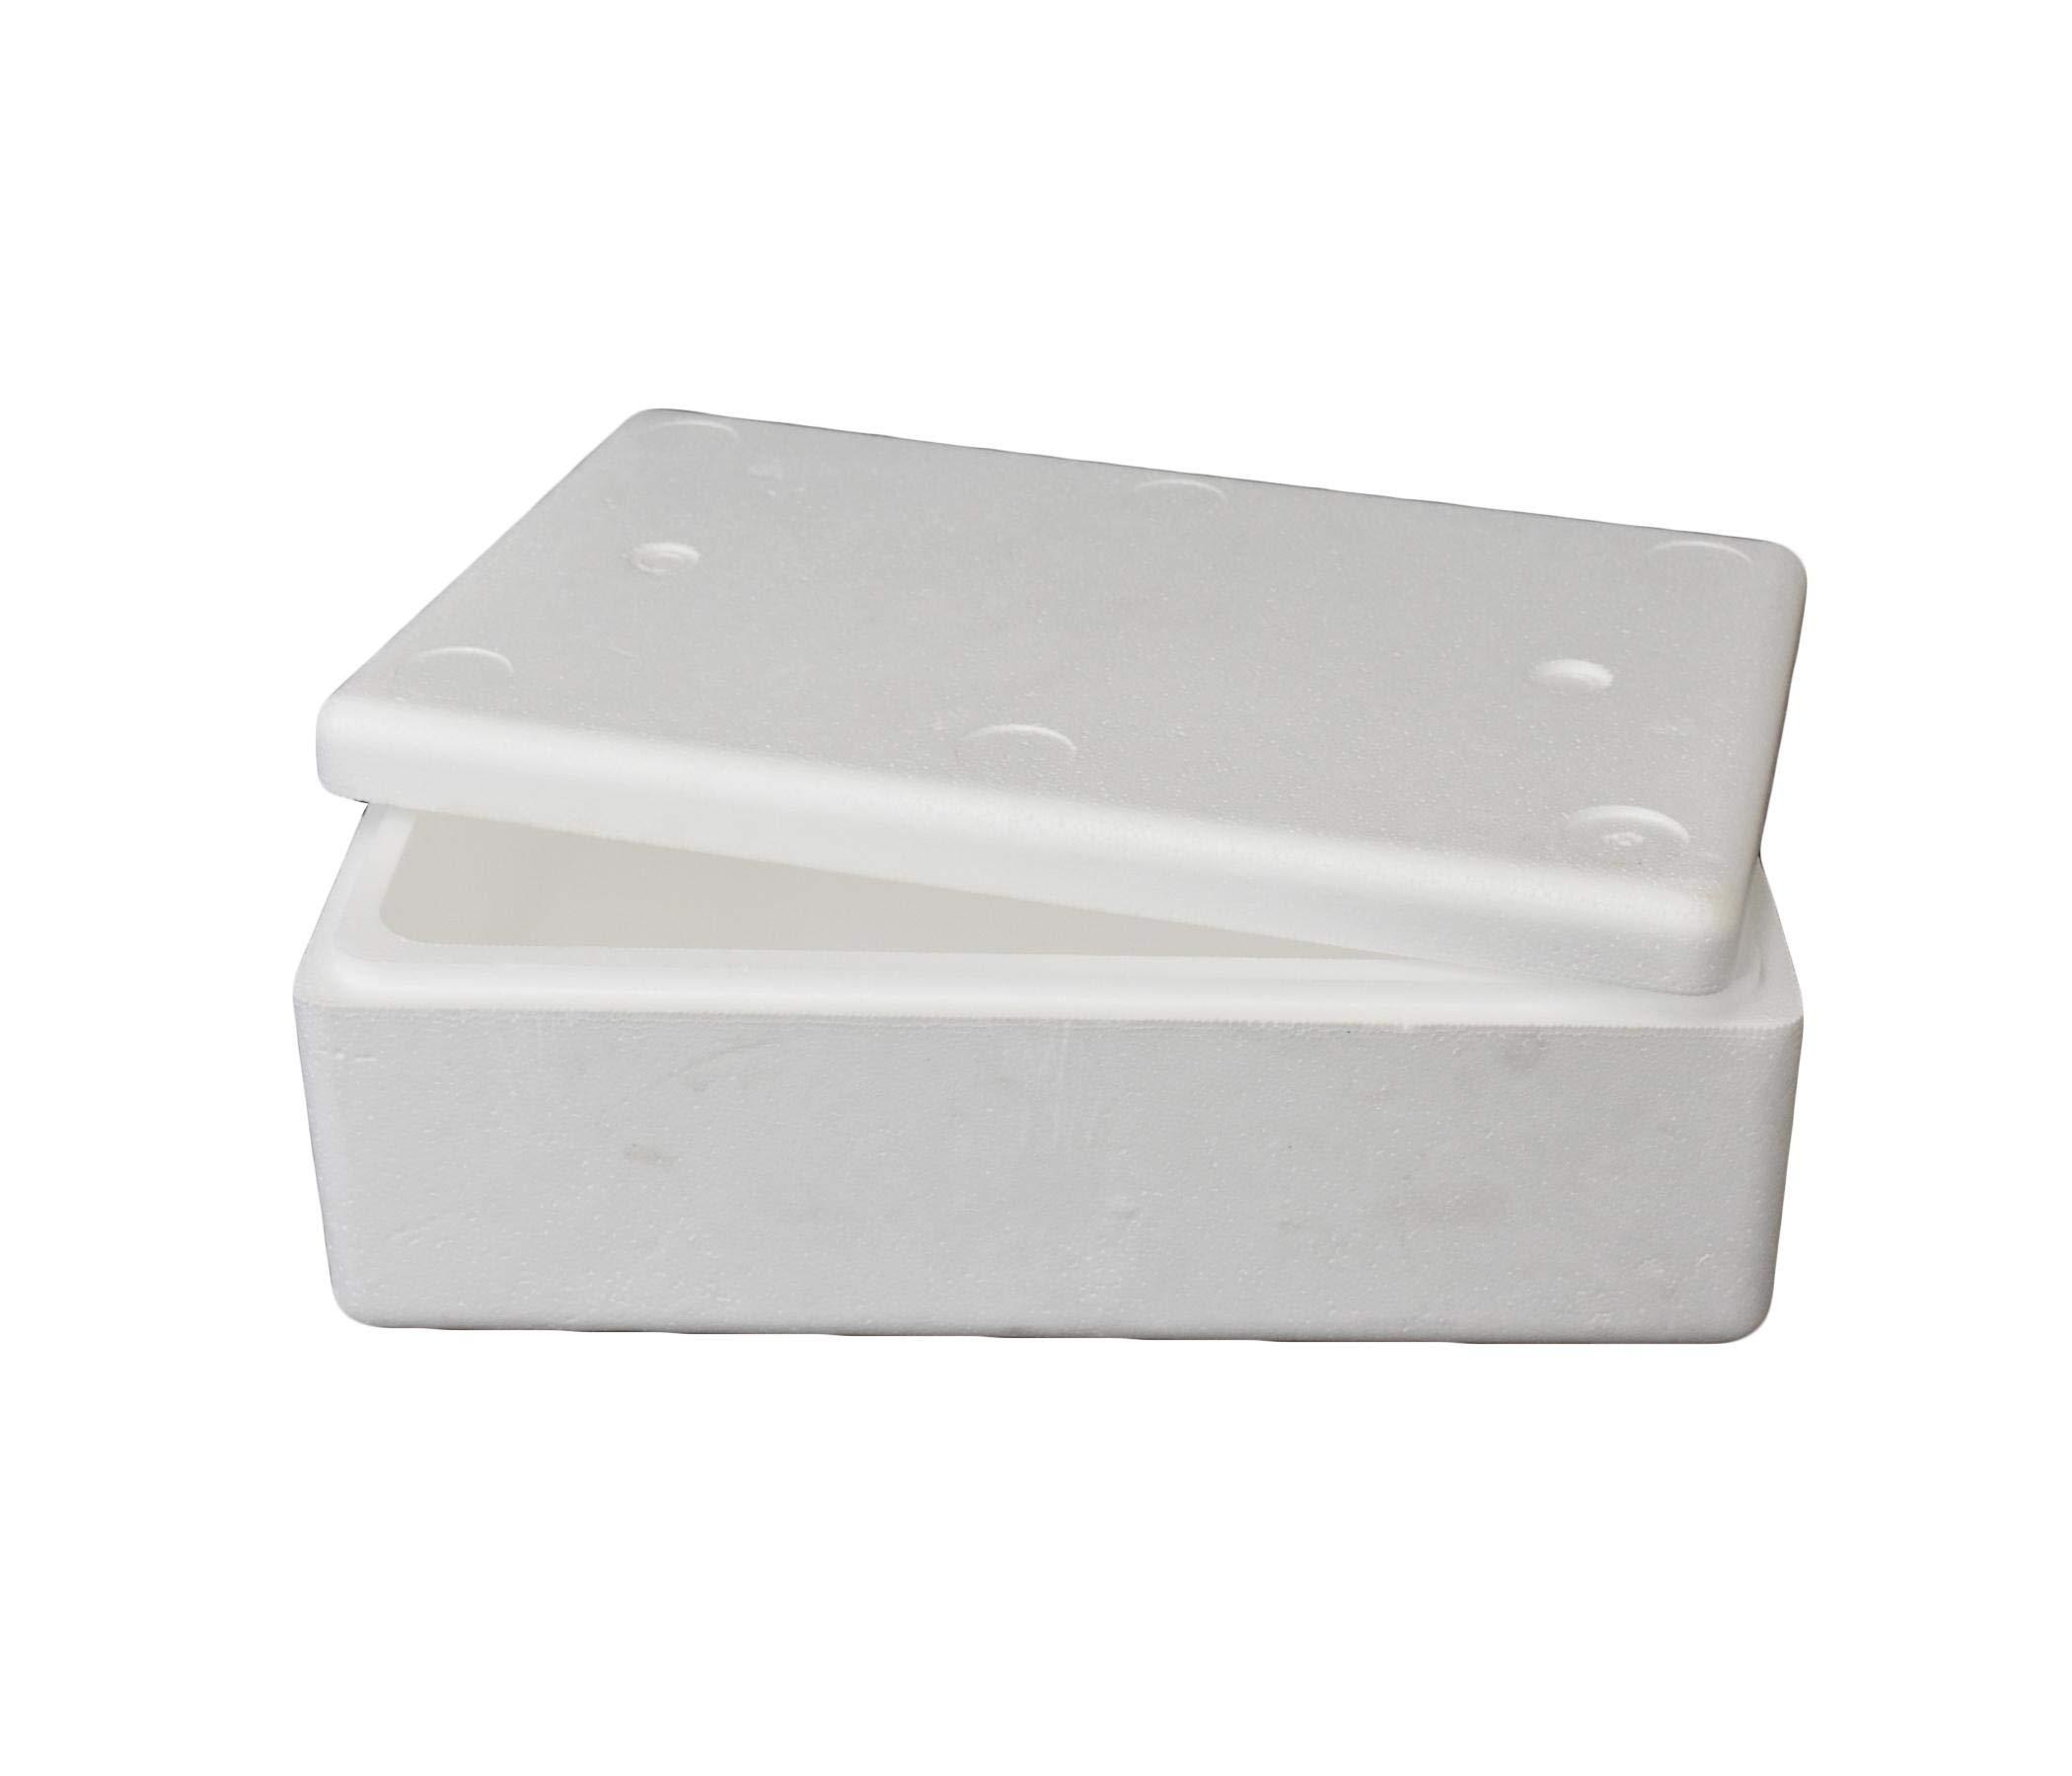 Styrofoam Box 5 KG Capacity Price in UAE | Amazon ae | other